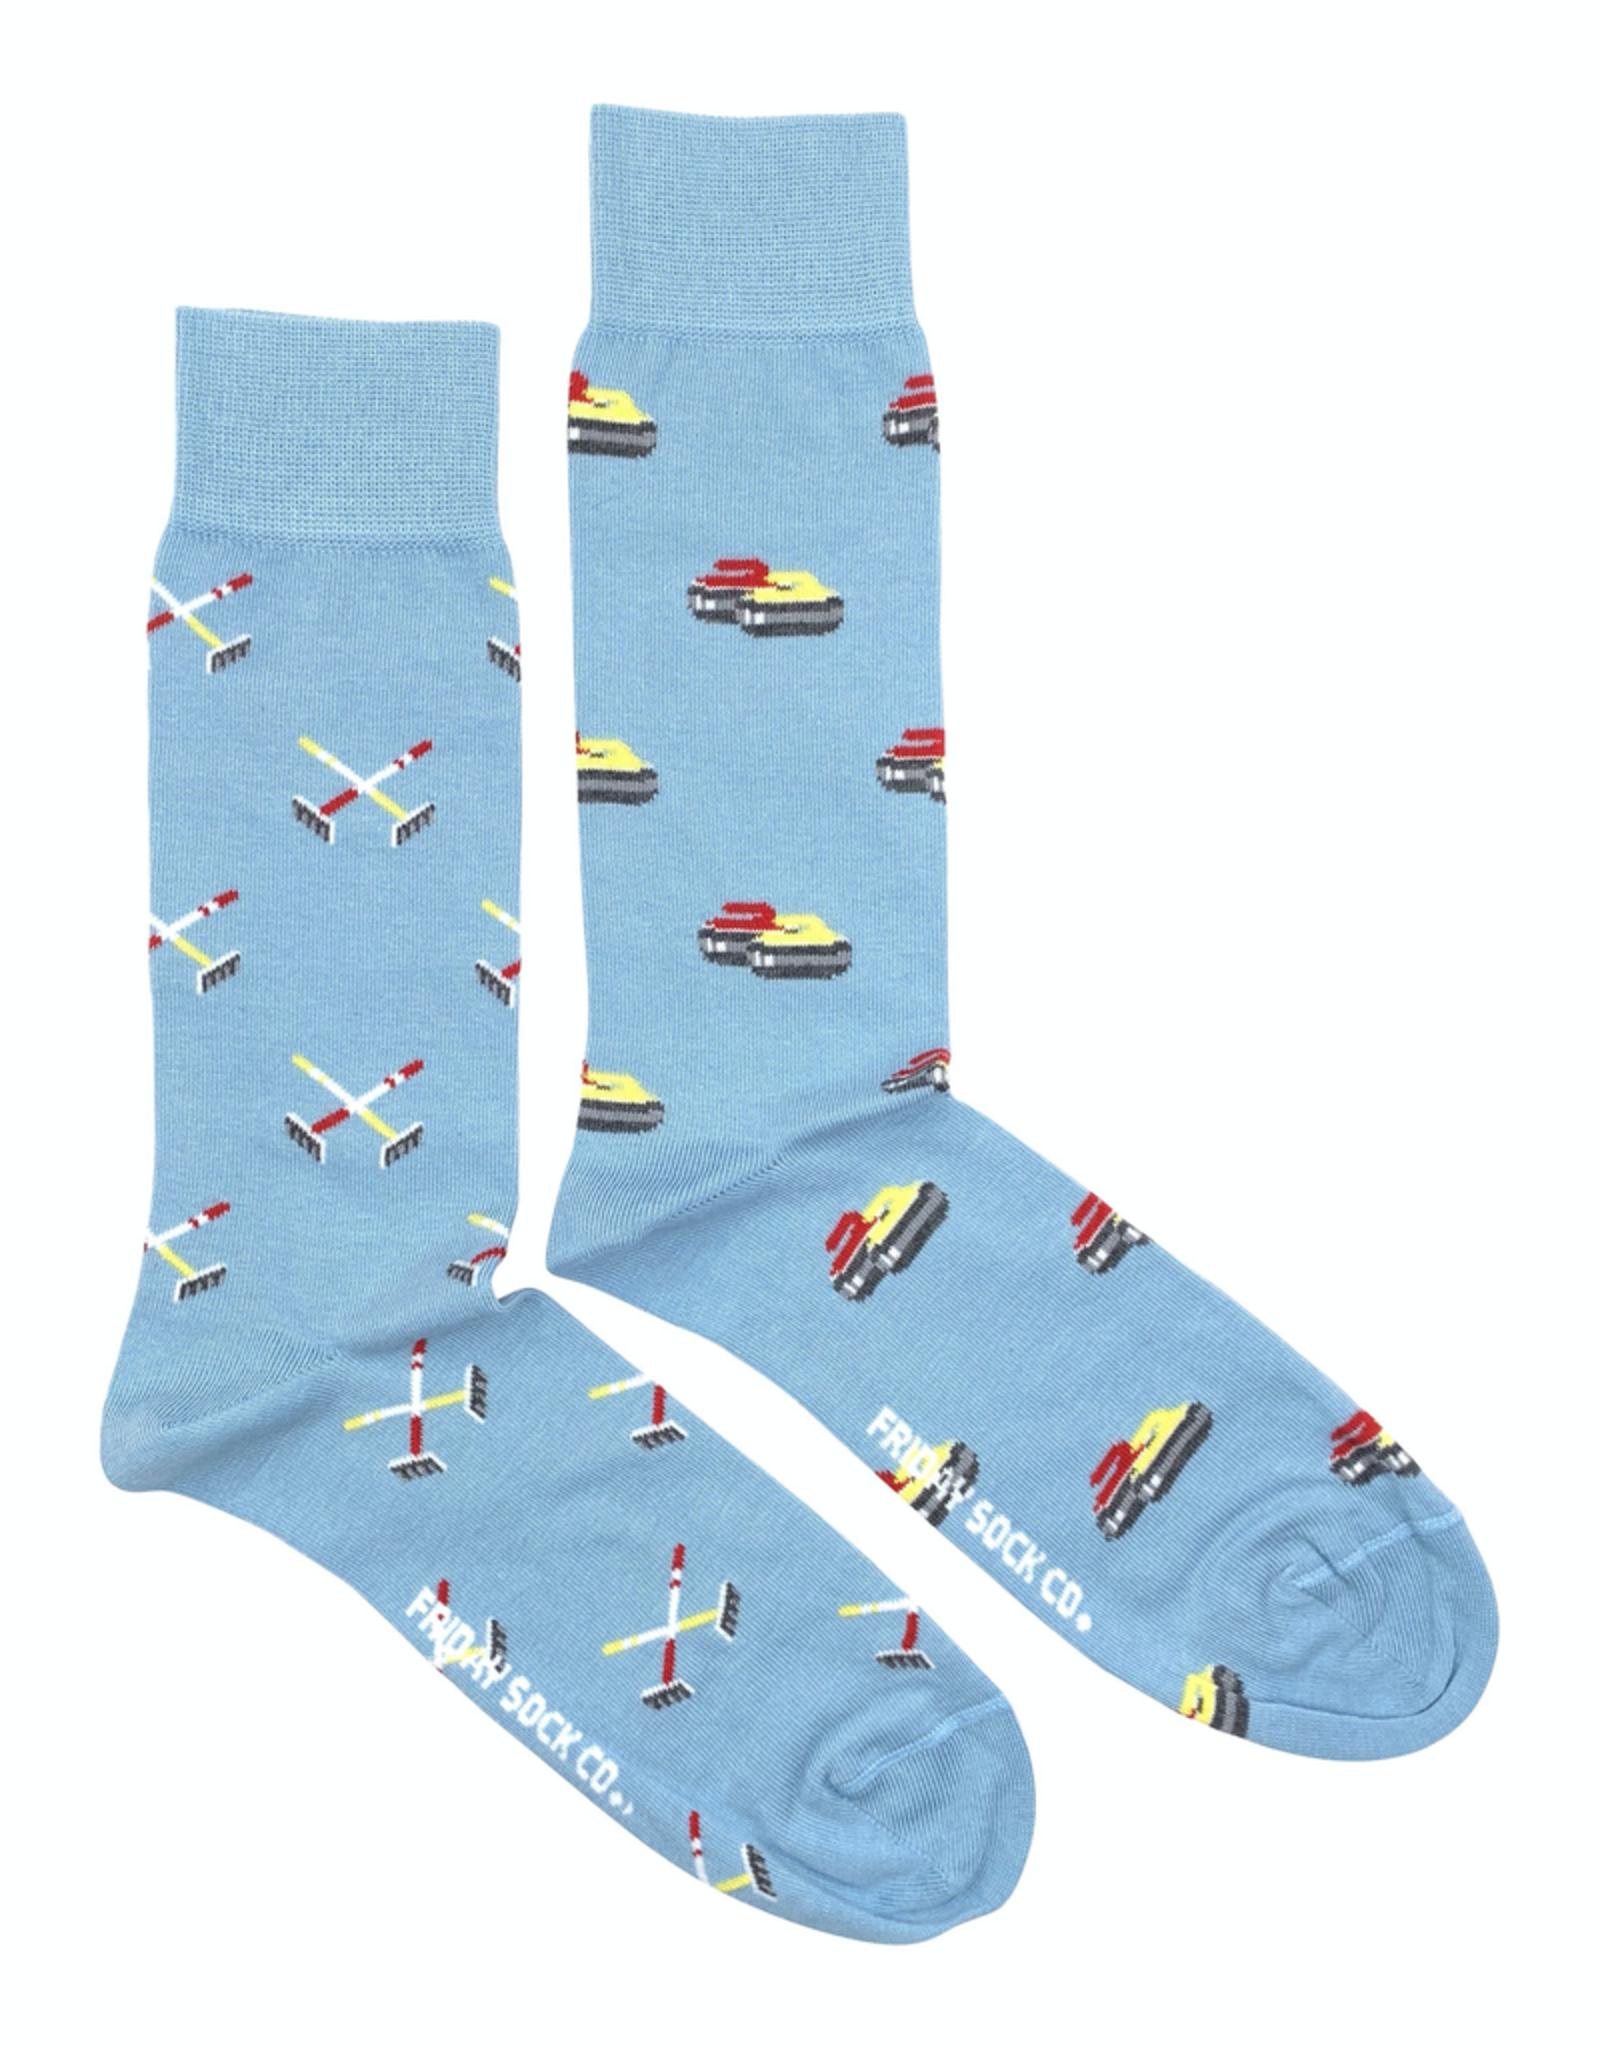 Friday Sock Co Rock And Broom Curling Socks